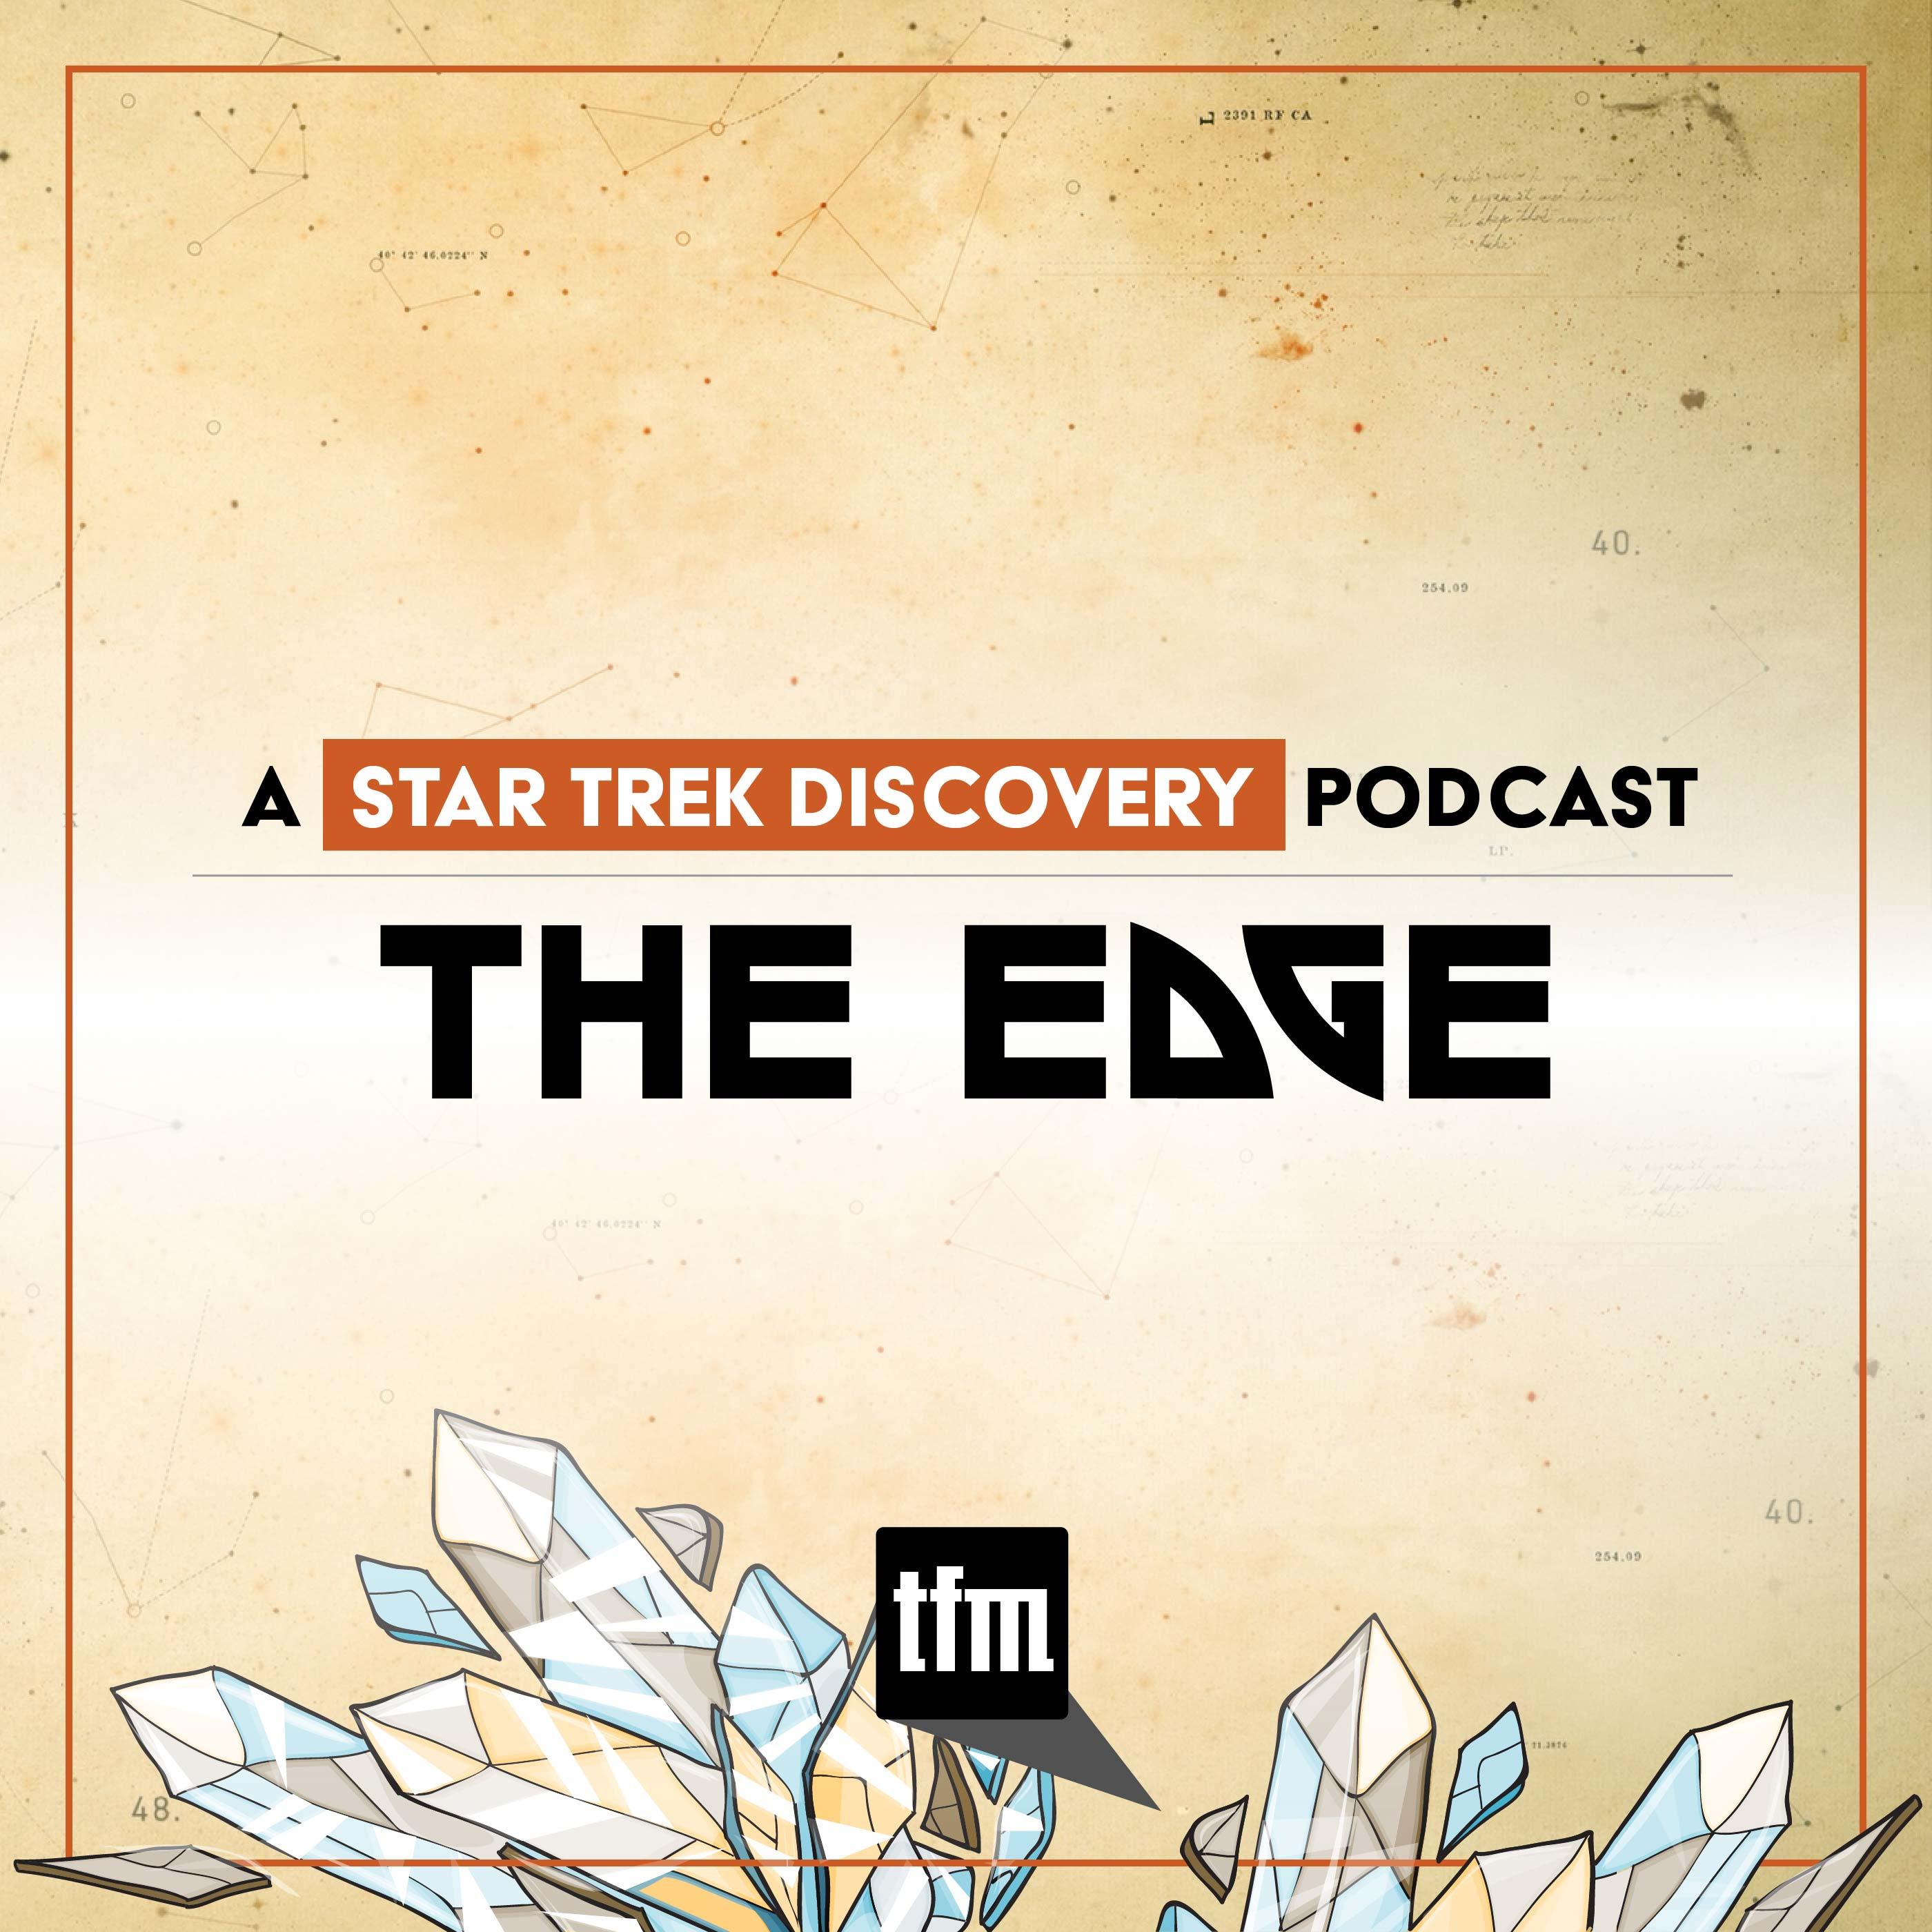 The Edge: A Star Trek Discovery Podcast show art